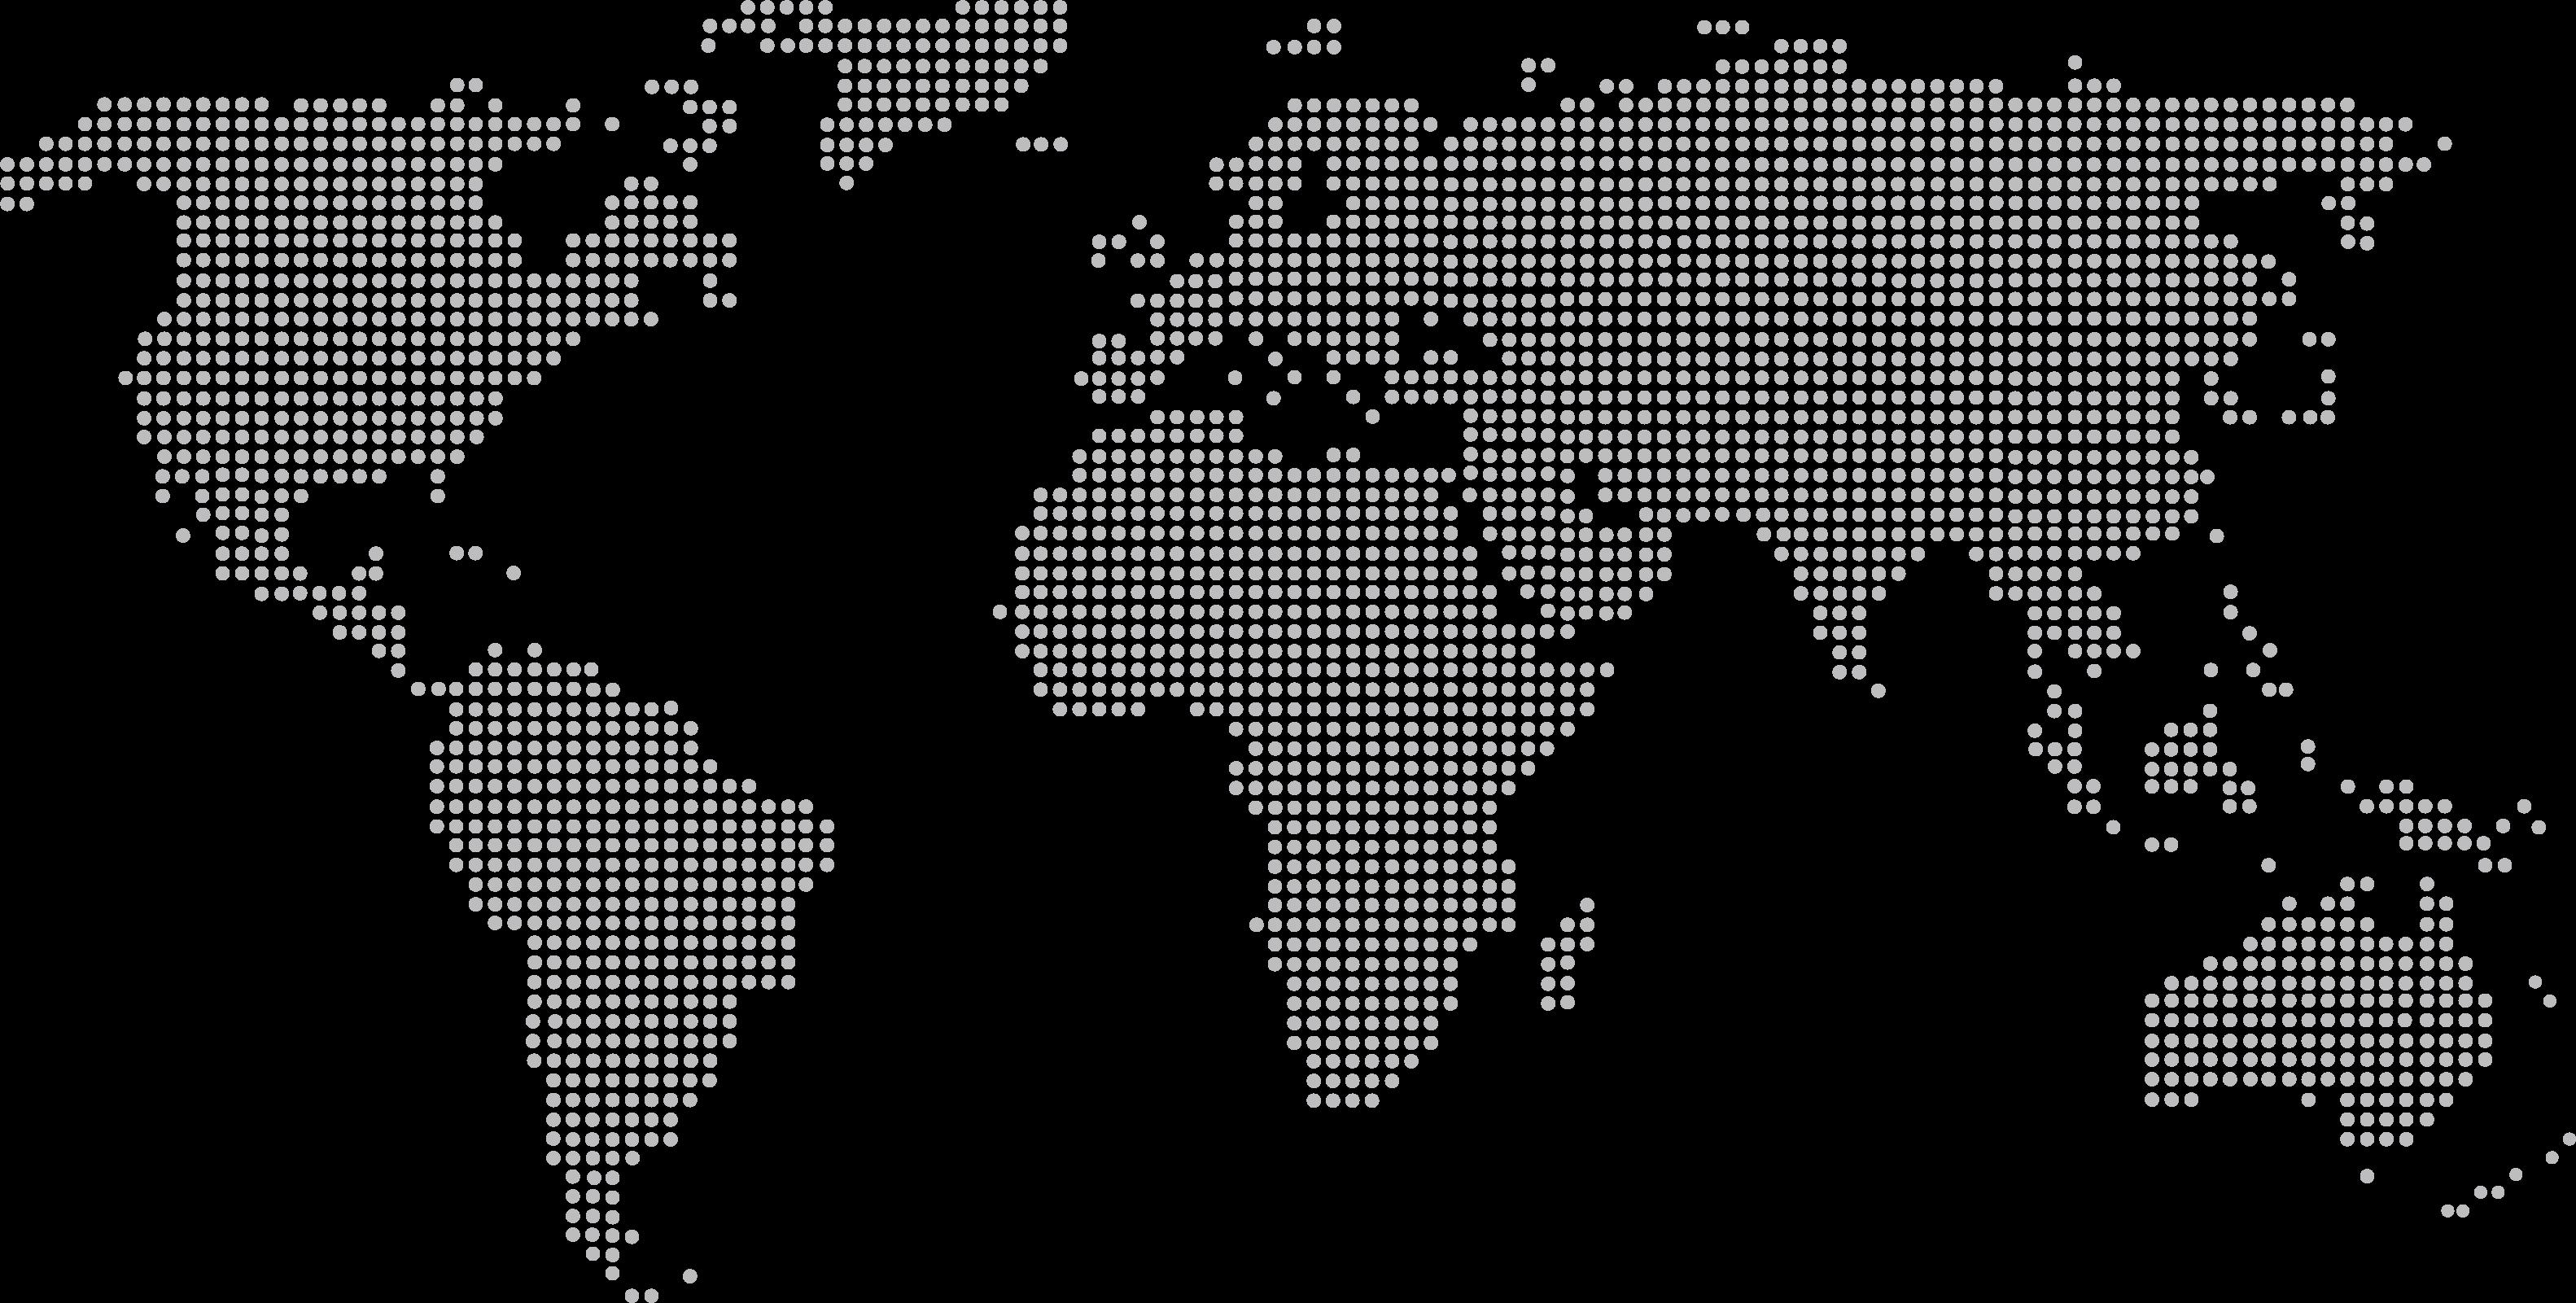 gdoptics-mikrolinsen-weltkarte-international-global